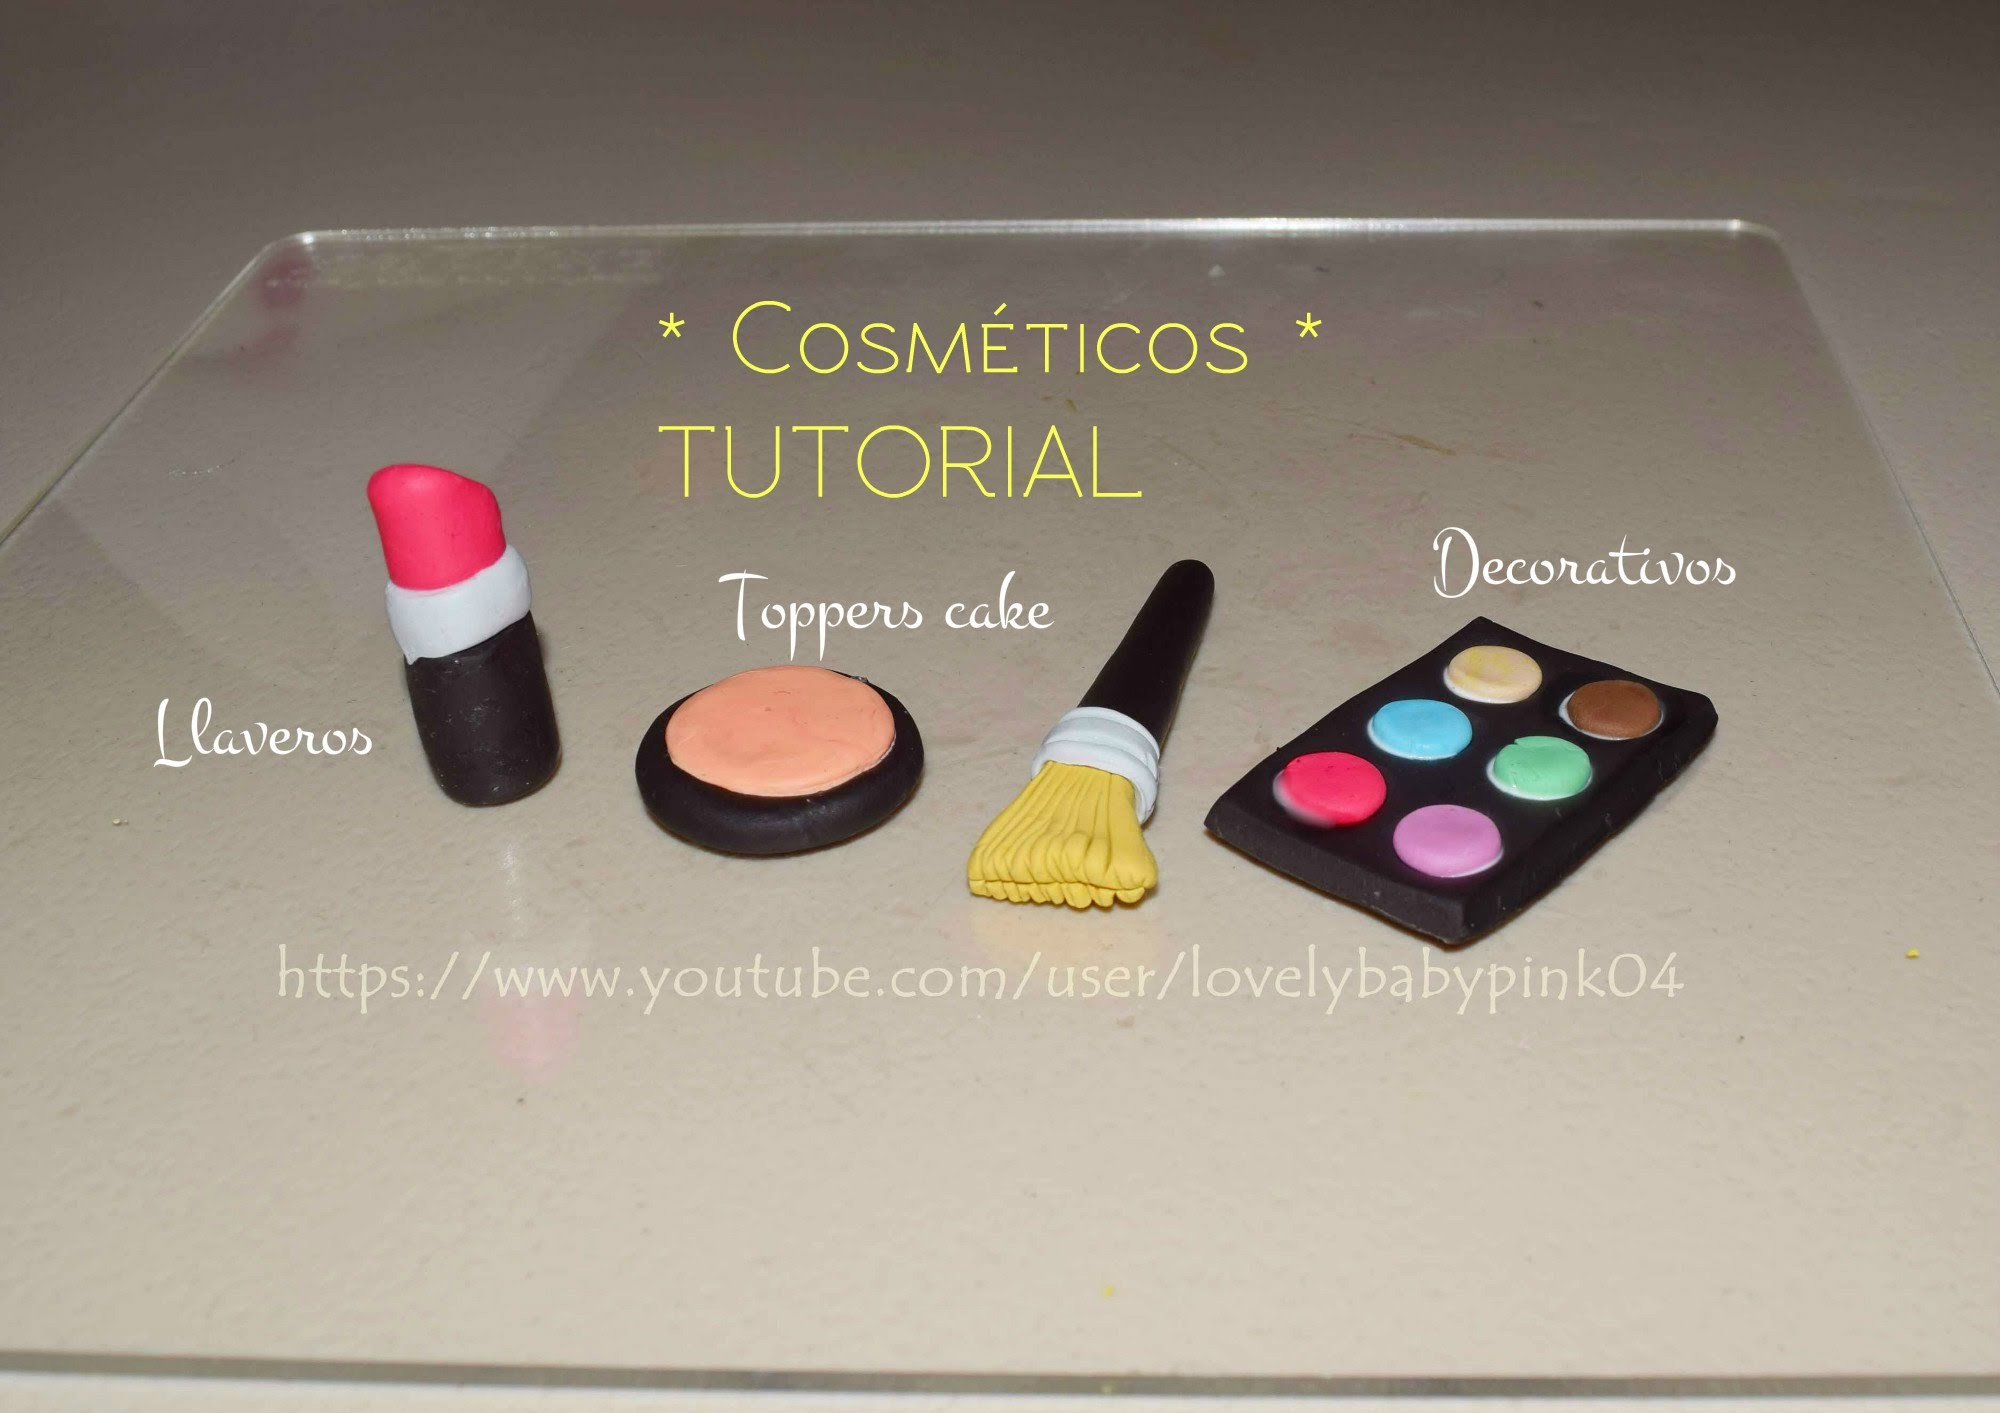 Cosmeticos Decorativos - Manualidades figuras porcelana fría